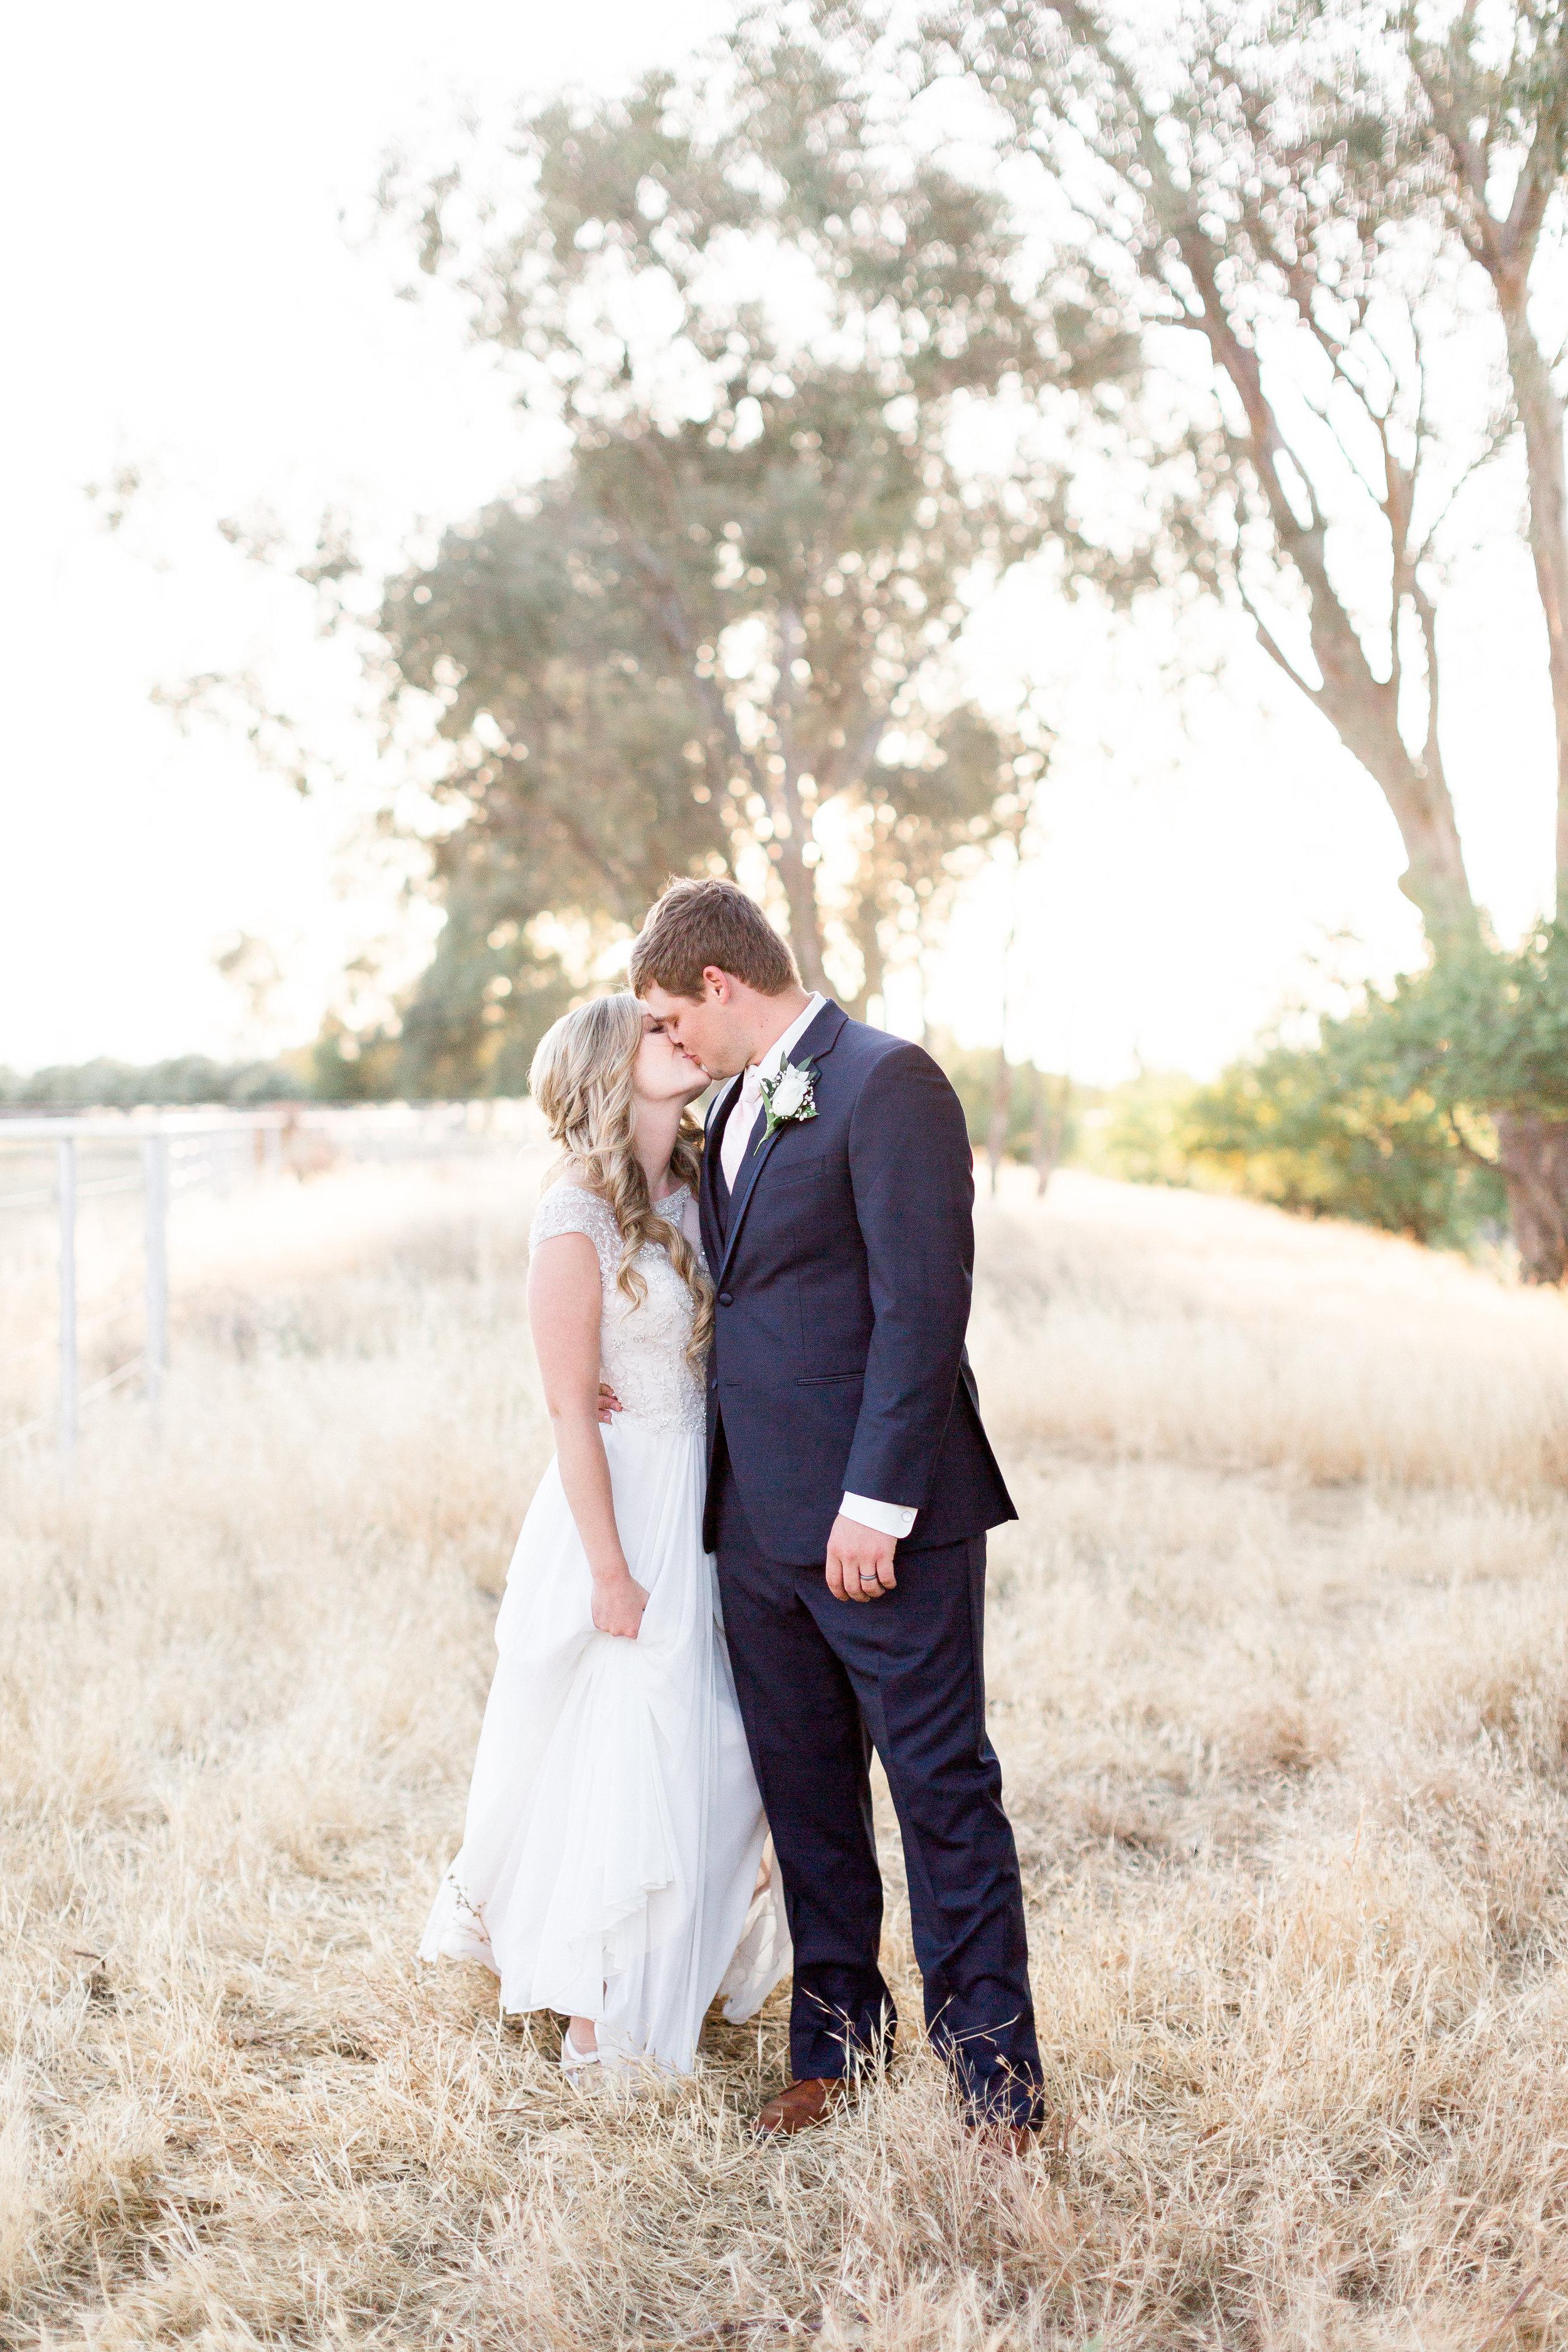 A-Private-Ranch-Northern-California-Wedding-1.jpg